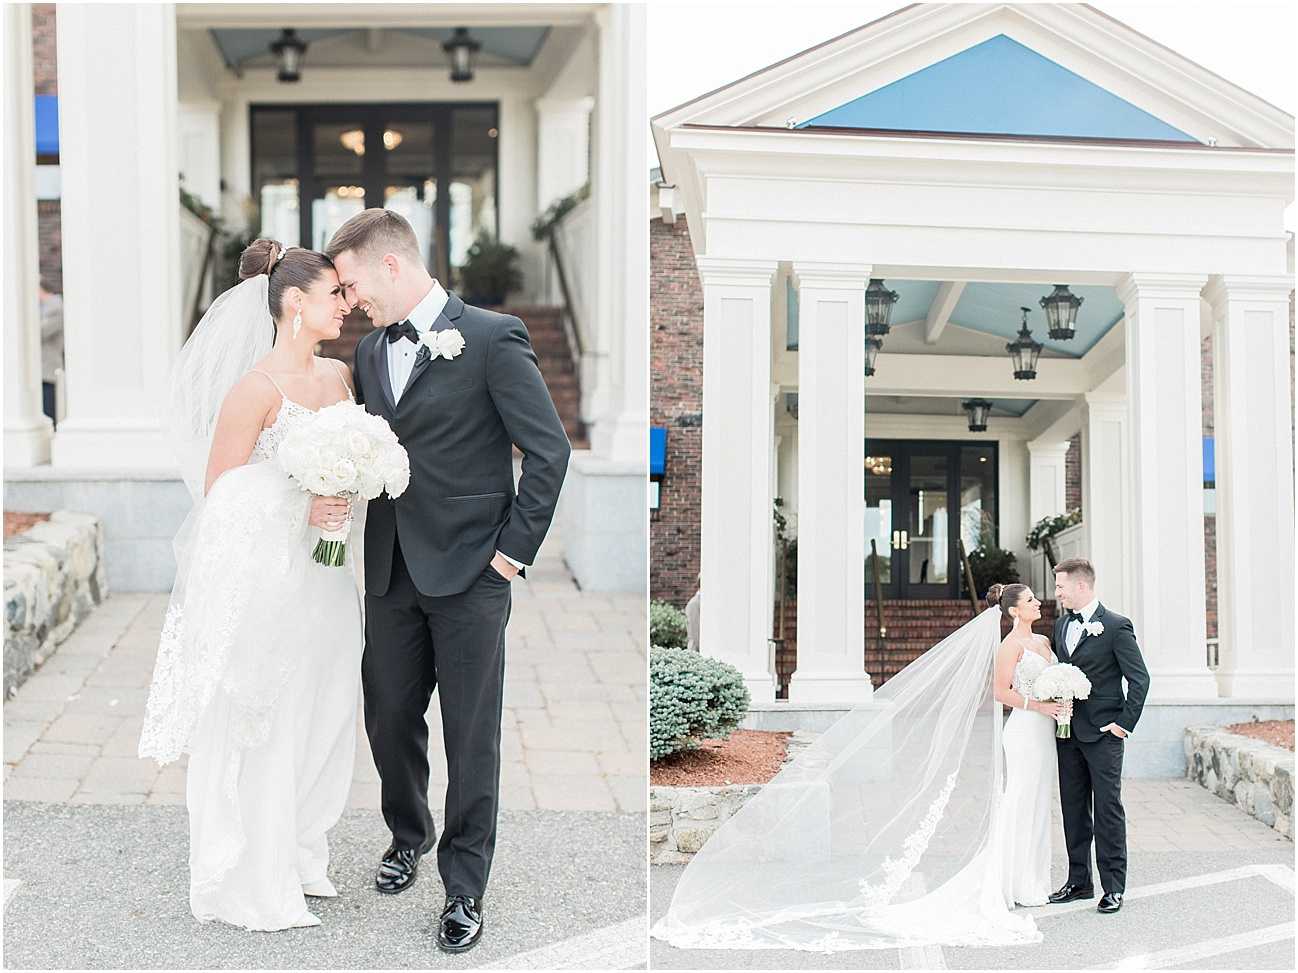 bianca_chris_danversport_italian_blush_gold_north_shore_cape_cod_boston_wedding_photographer_meredith_jane_photography_photo_1119.jpg